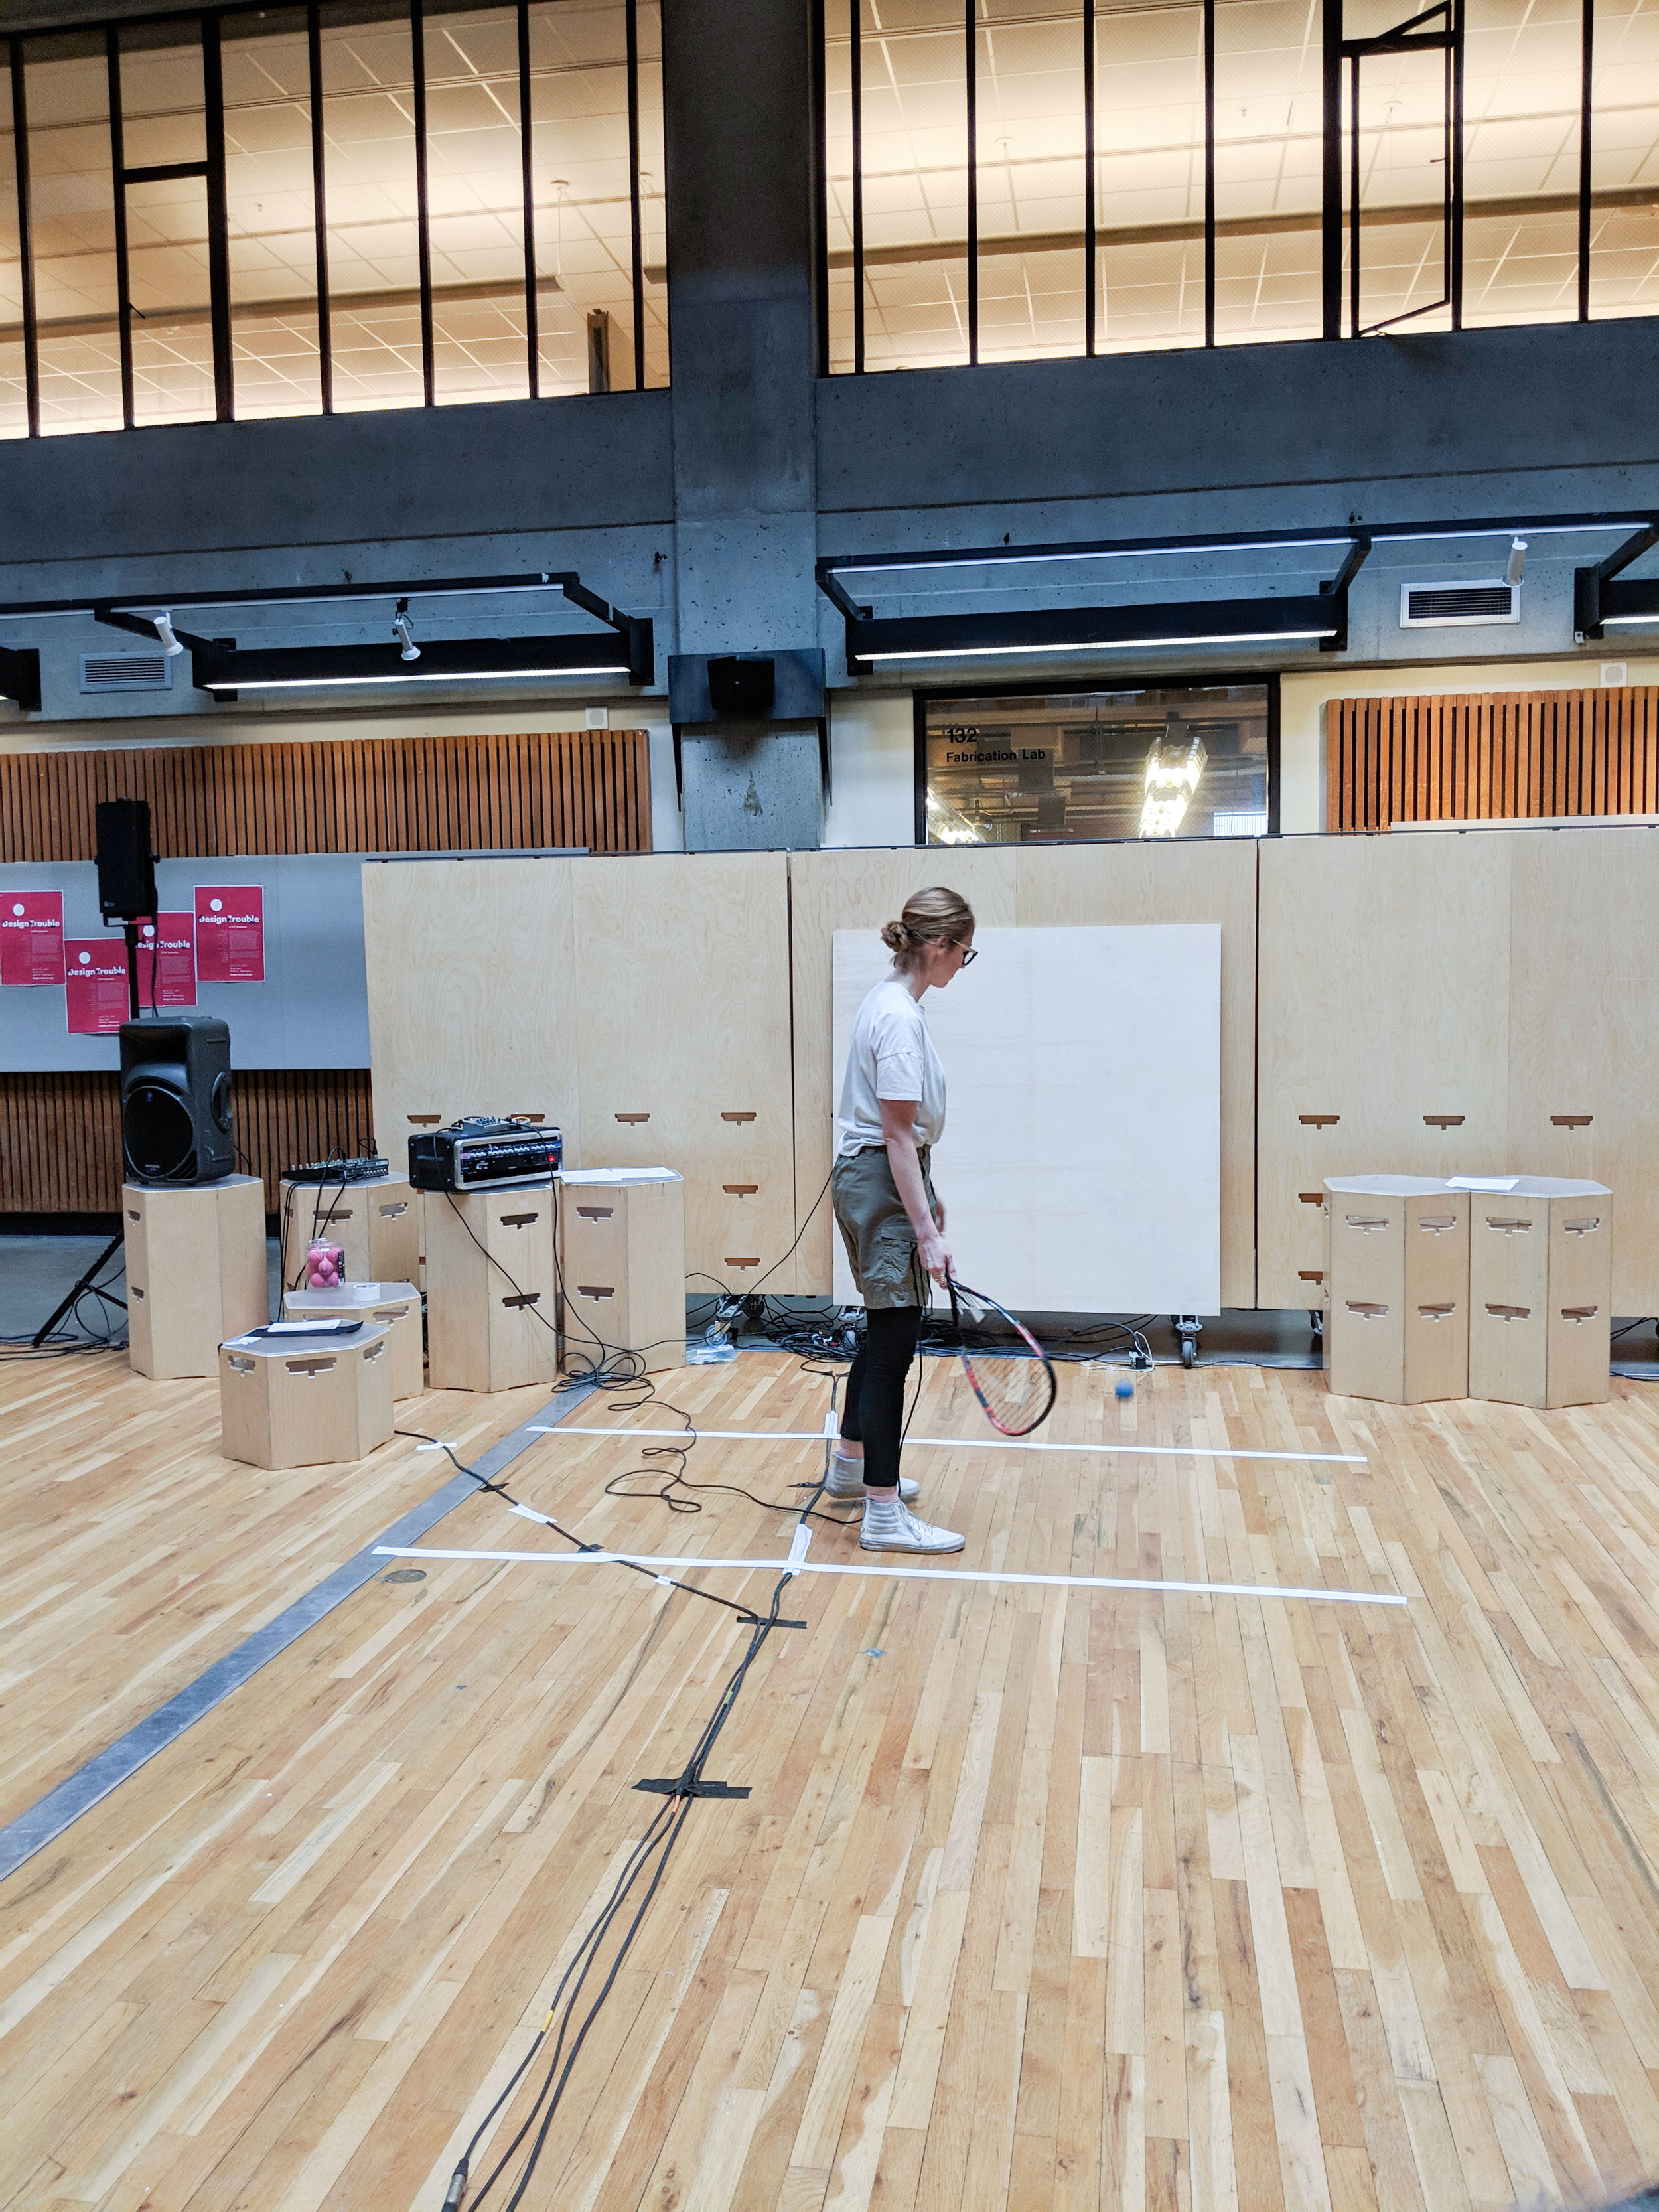 Design Trouble Symposium, Gould Hall of University of Washington, April 4, 2019